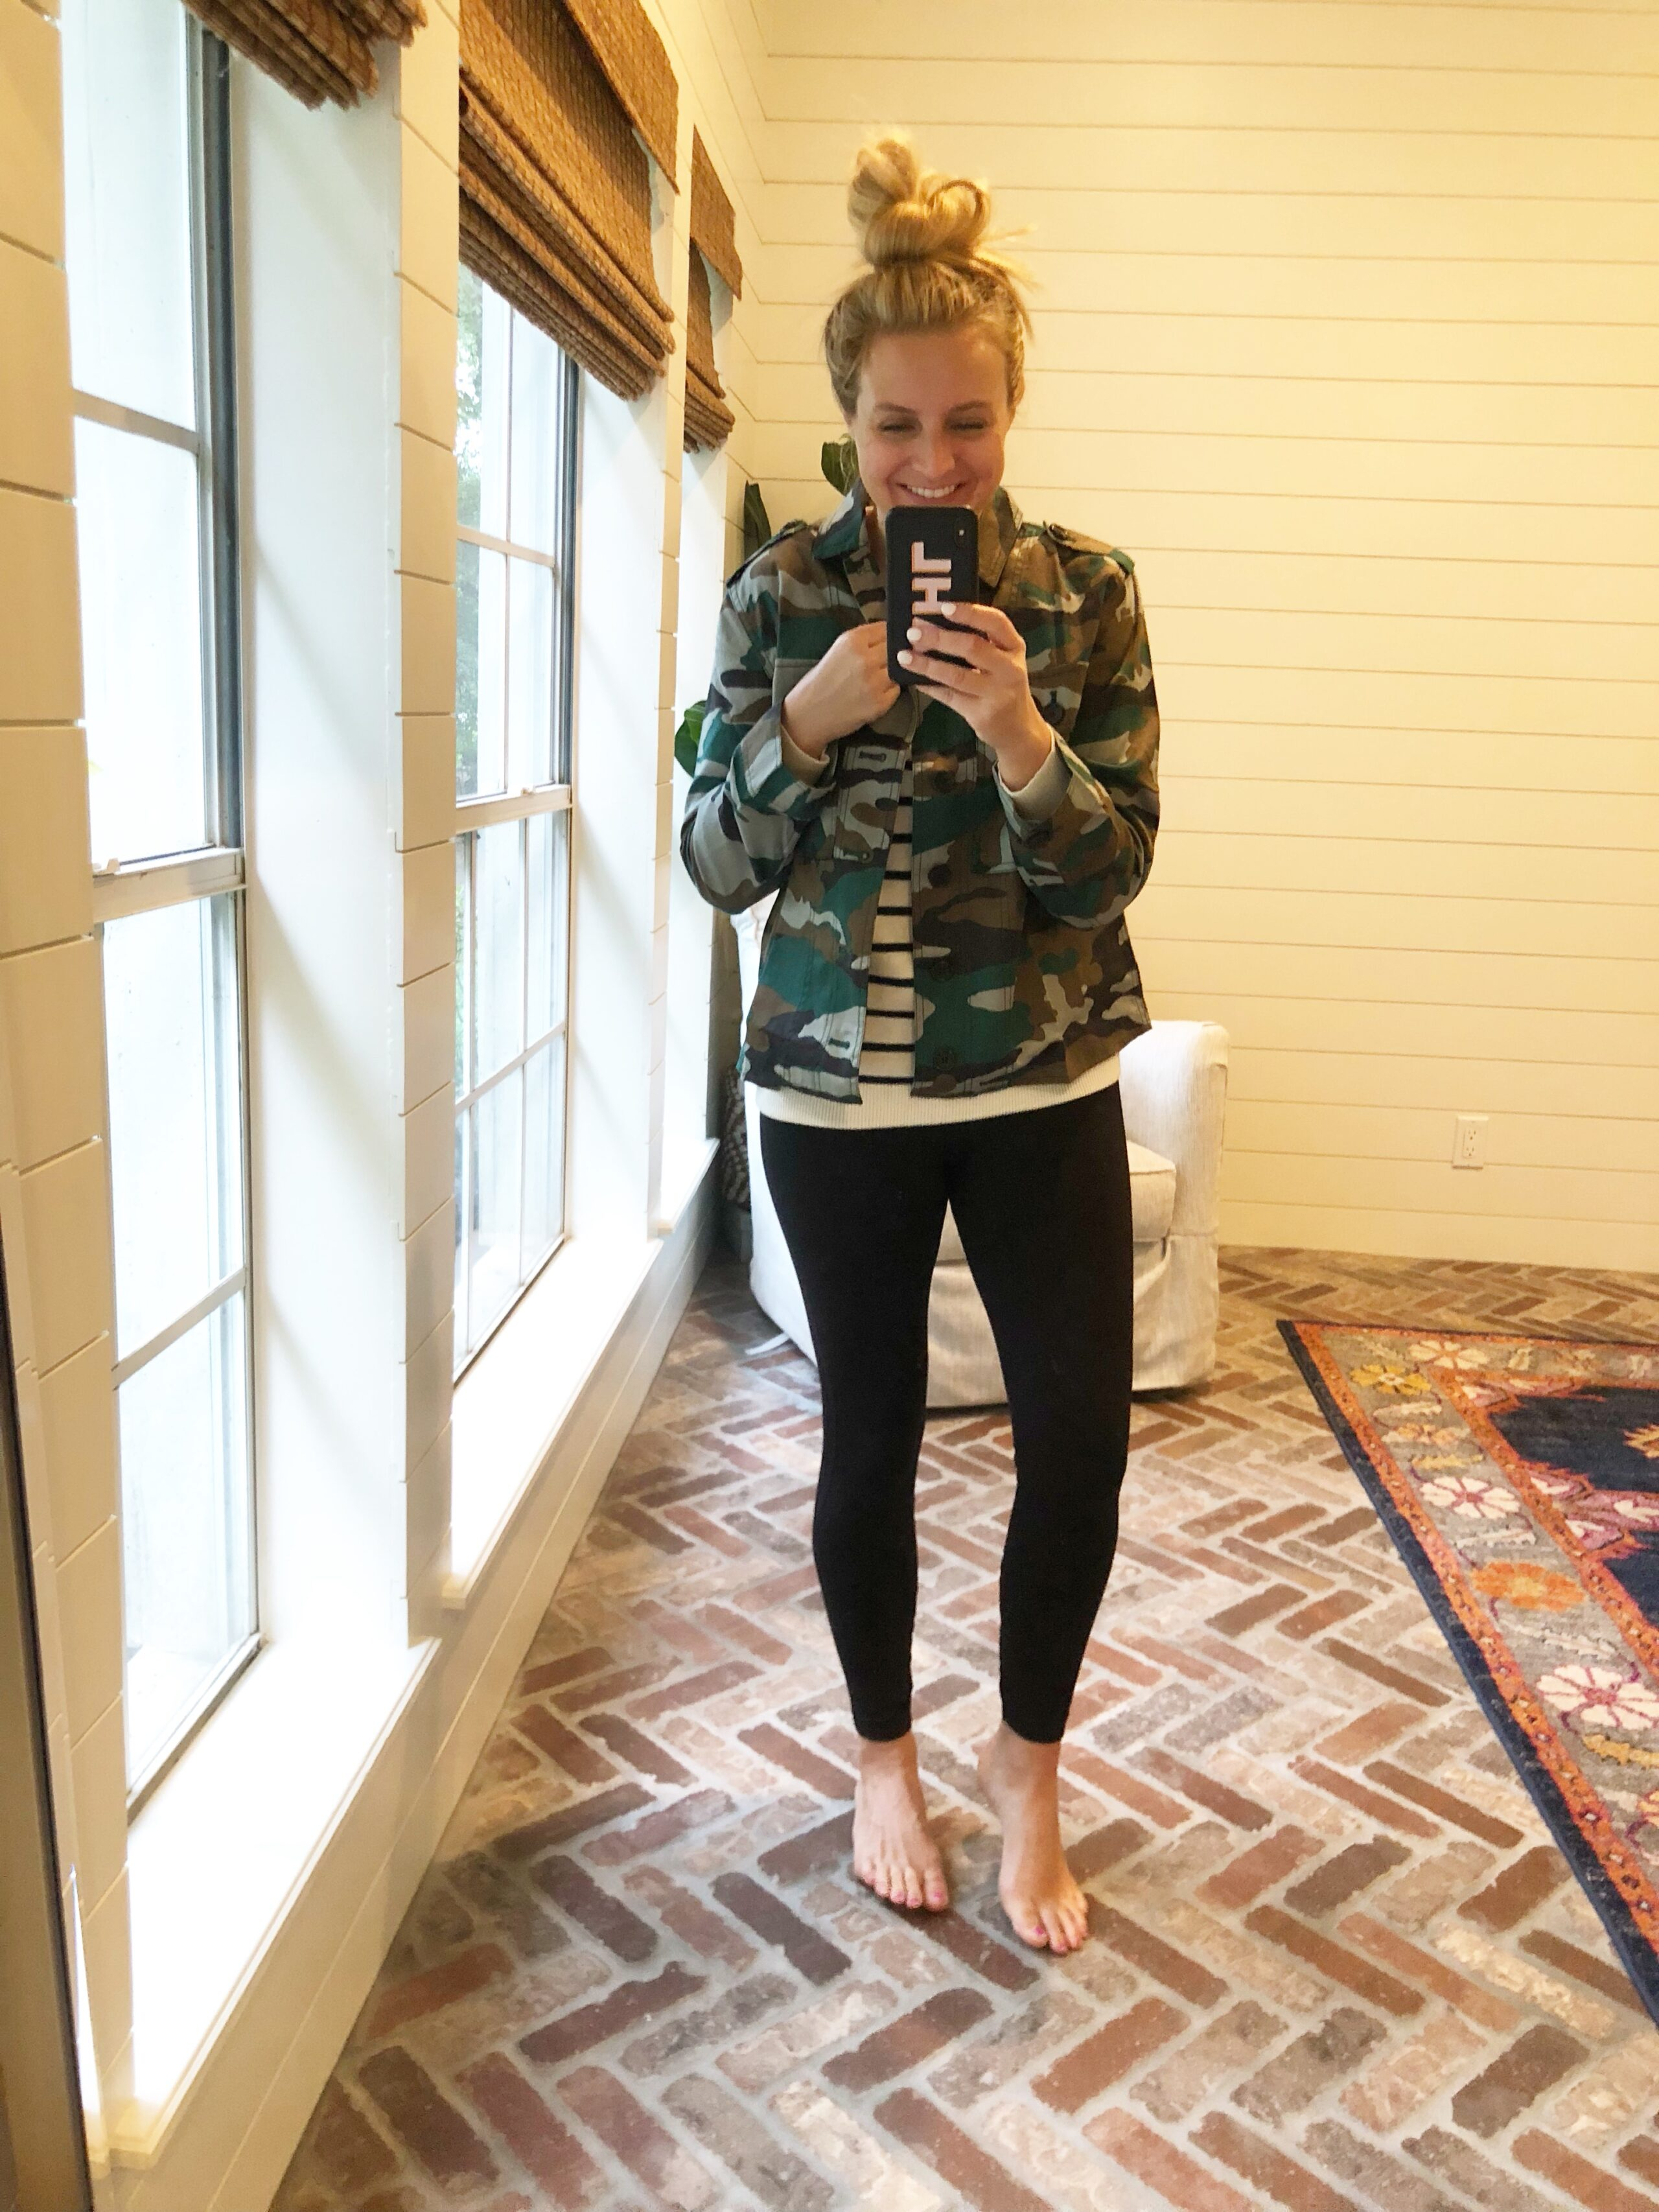 J Crew Favorites on Amazon, featured by popular Houston fashion blogger, Fancy Ashley: J Crew camo jacket